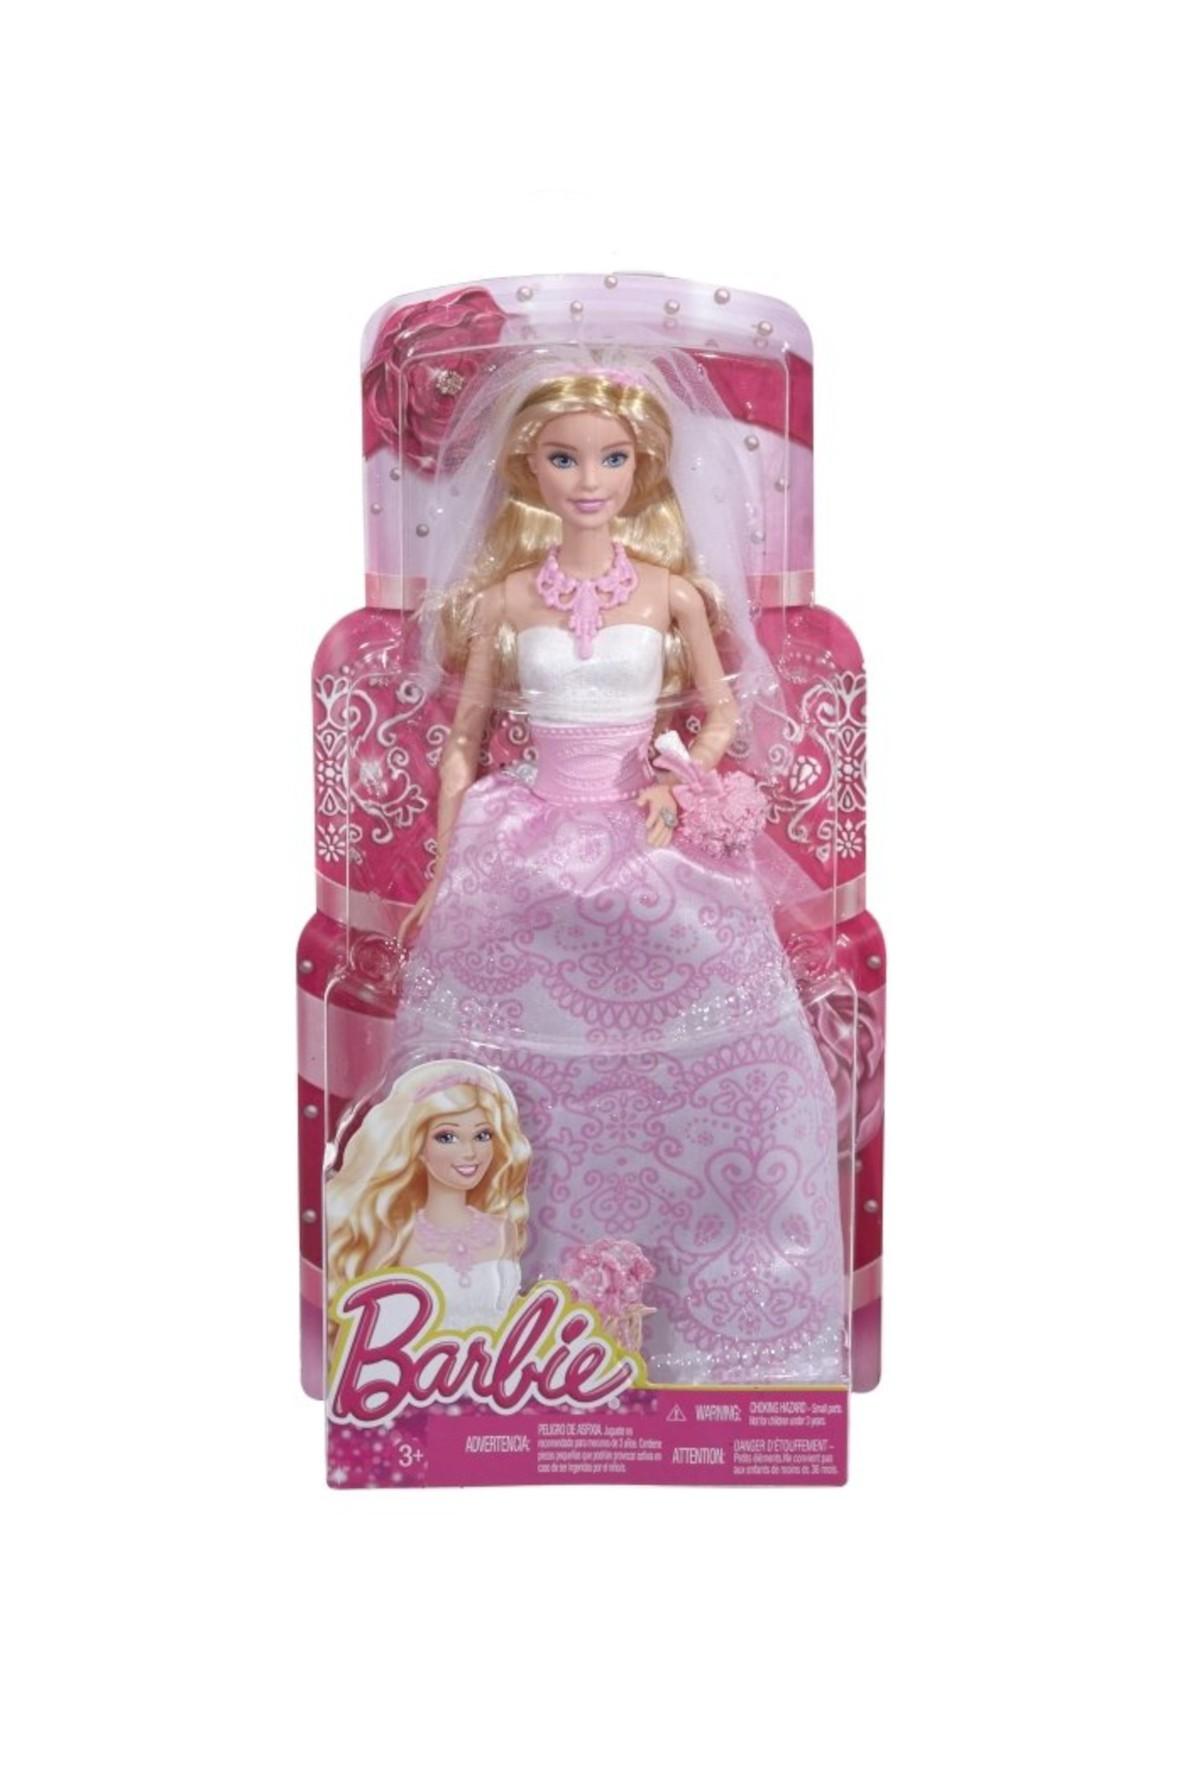 Barbie - Lalka Panna młoda wiek 3+